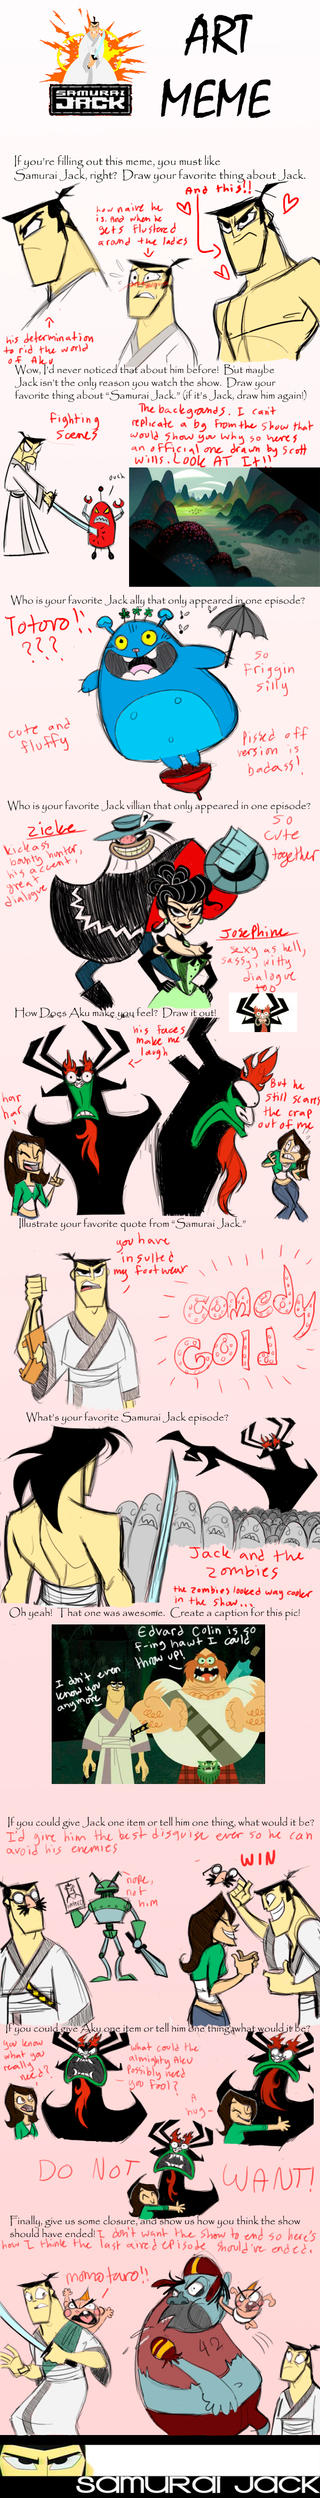 samurai jack meme by Kikoli